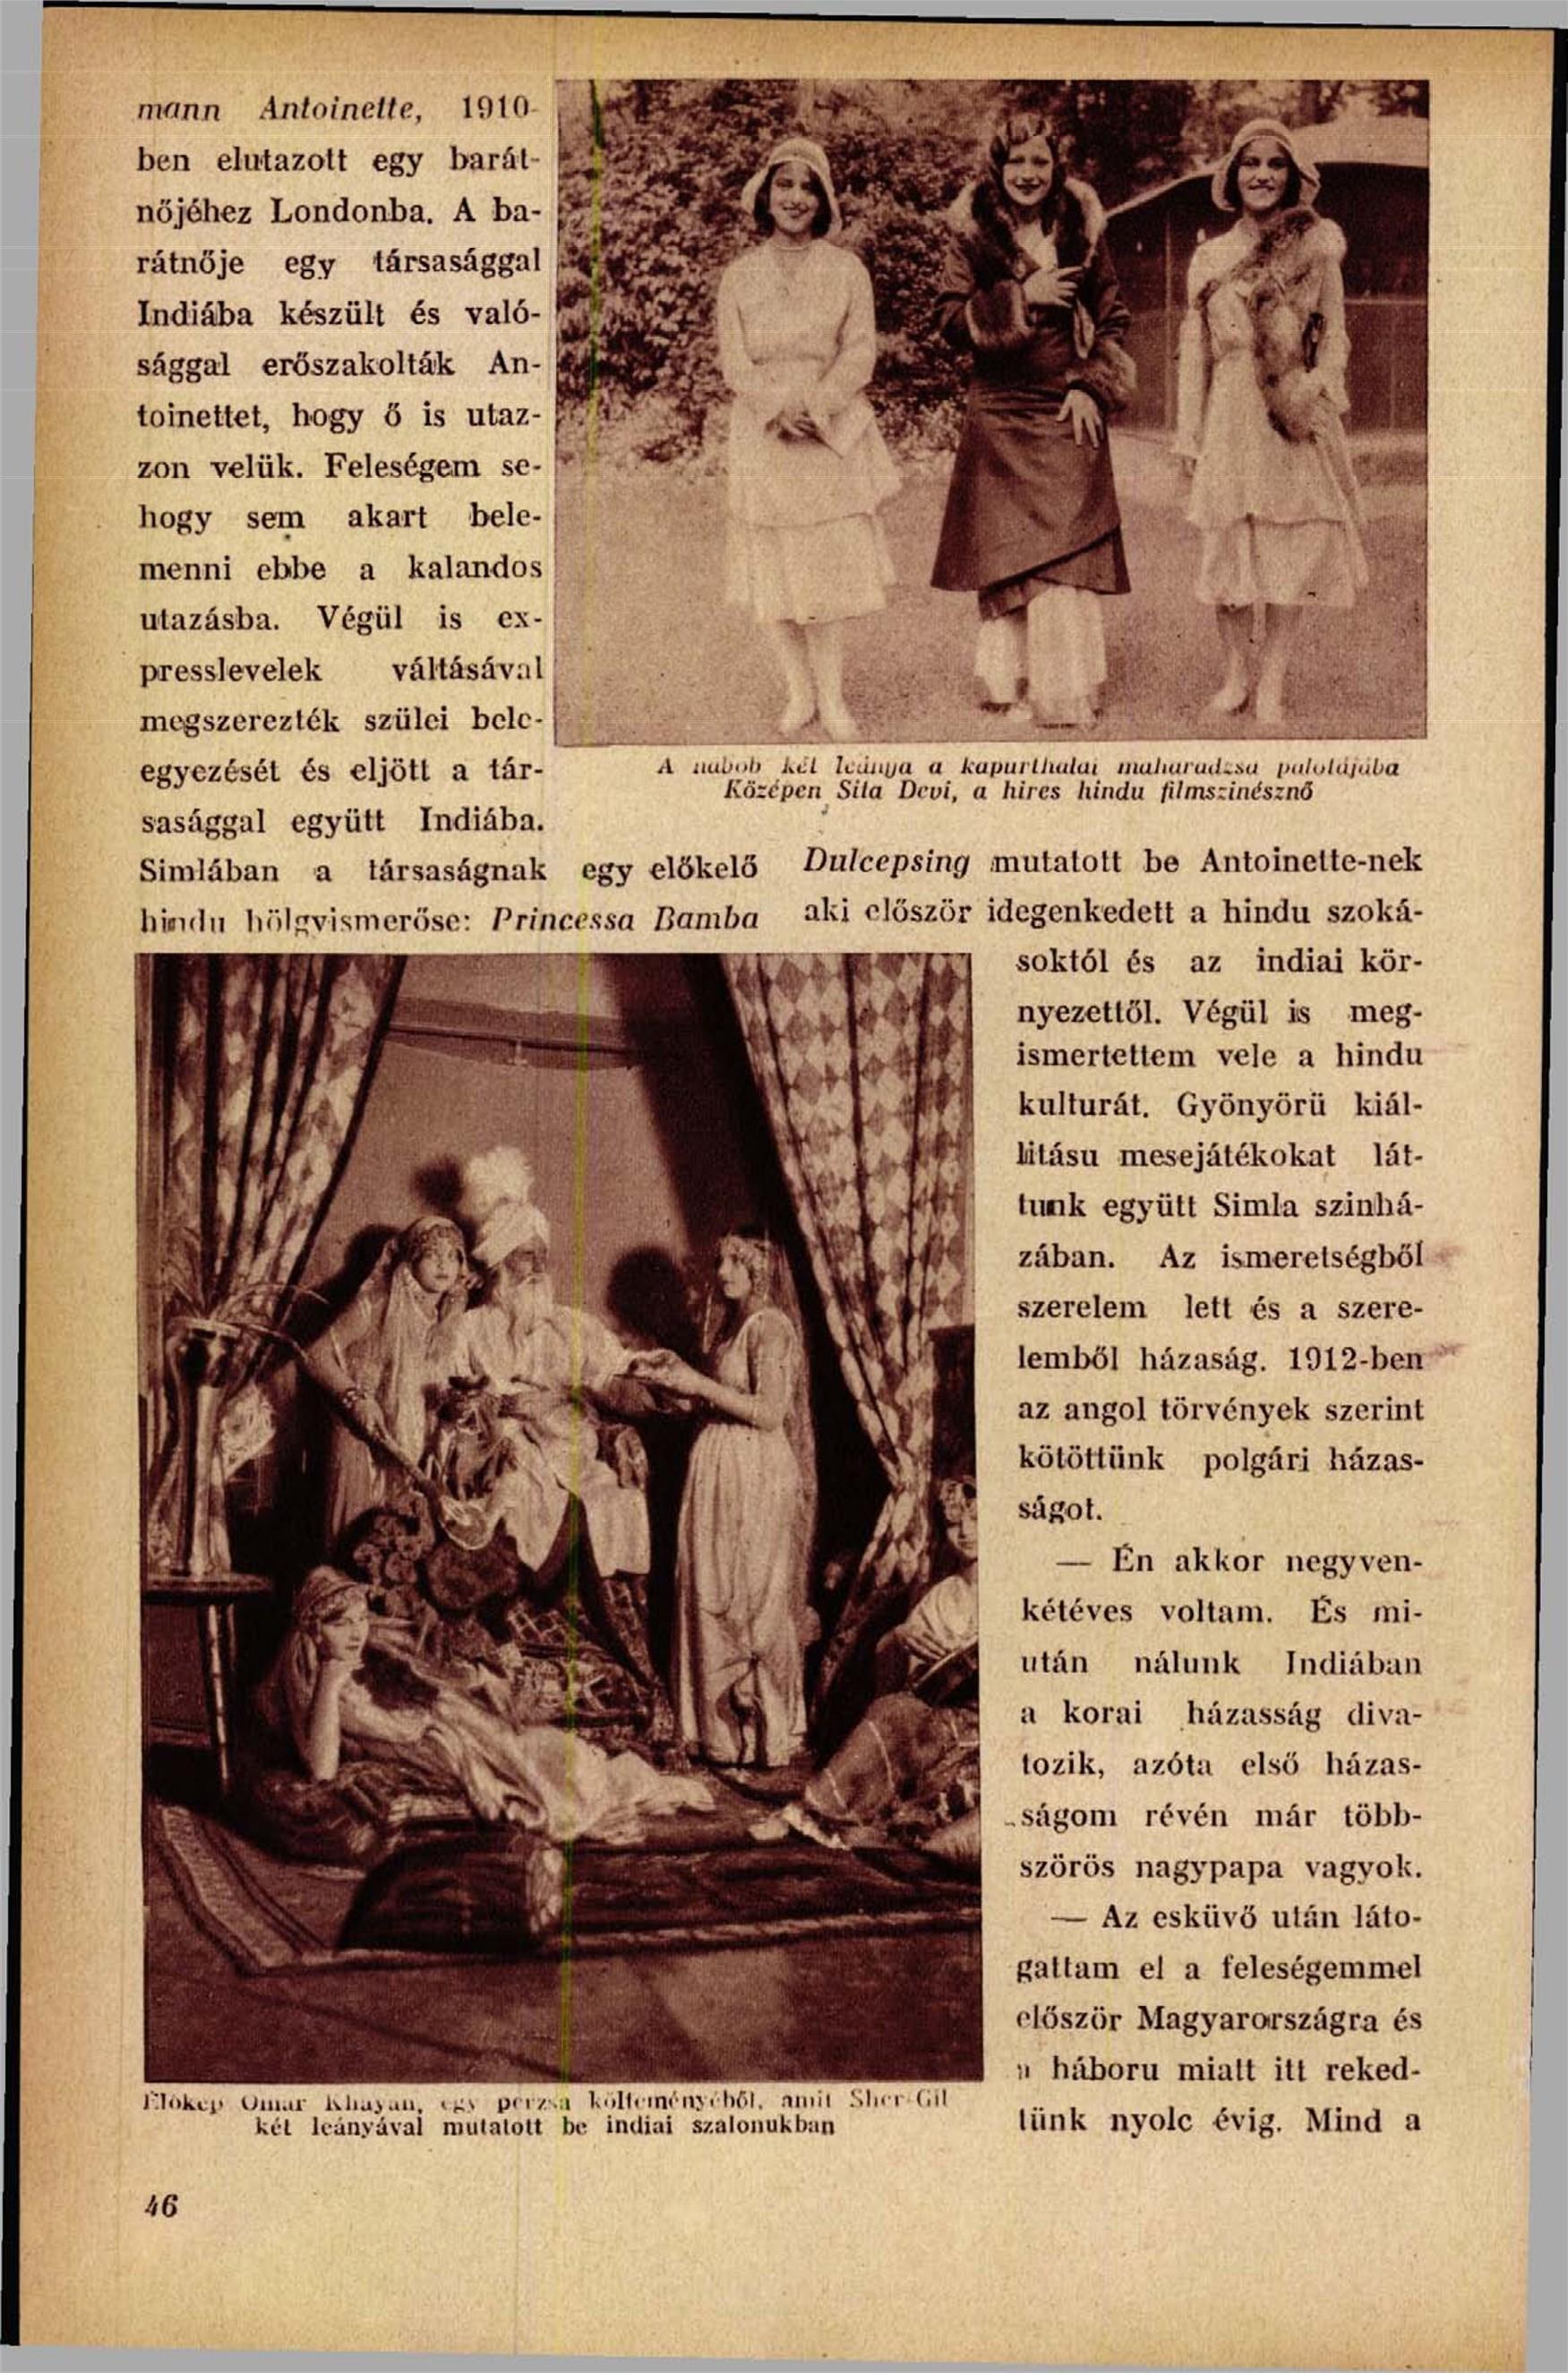 szinhazielet_1930_46_pages48-48.jpg